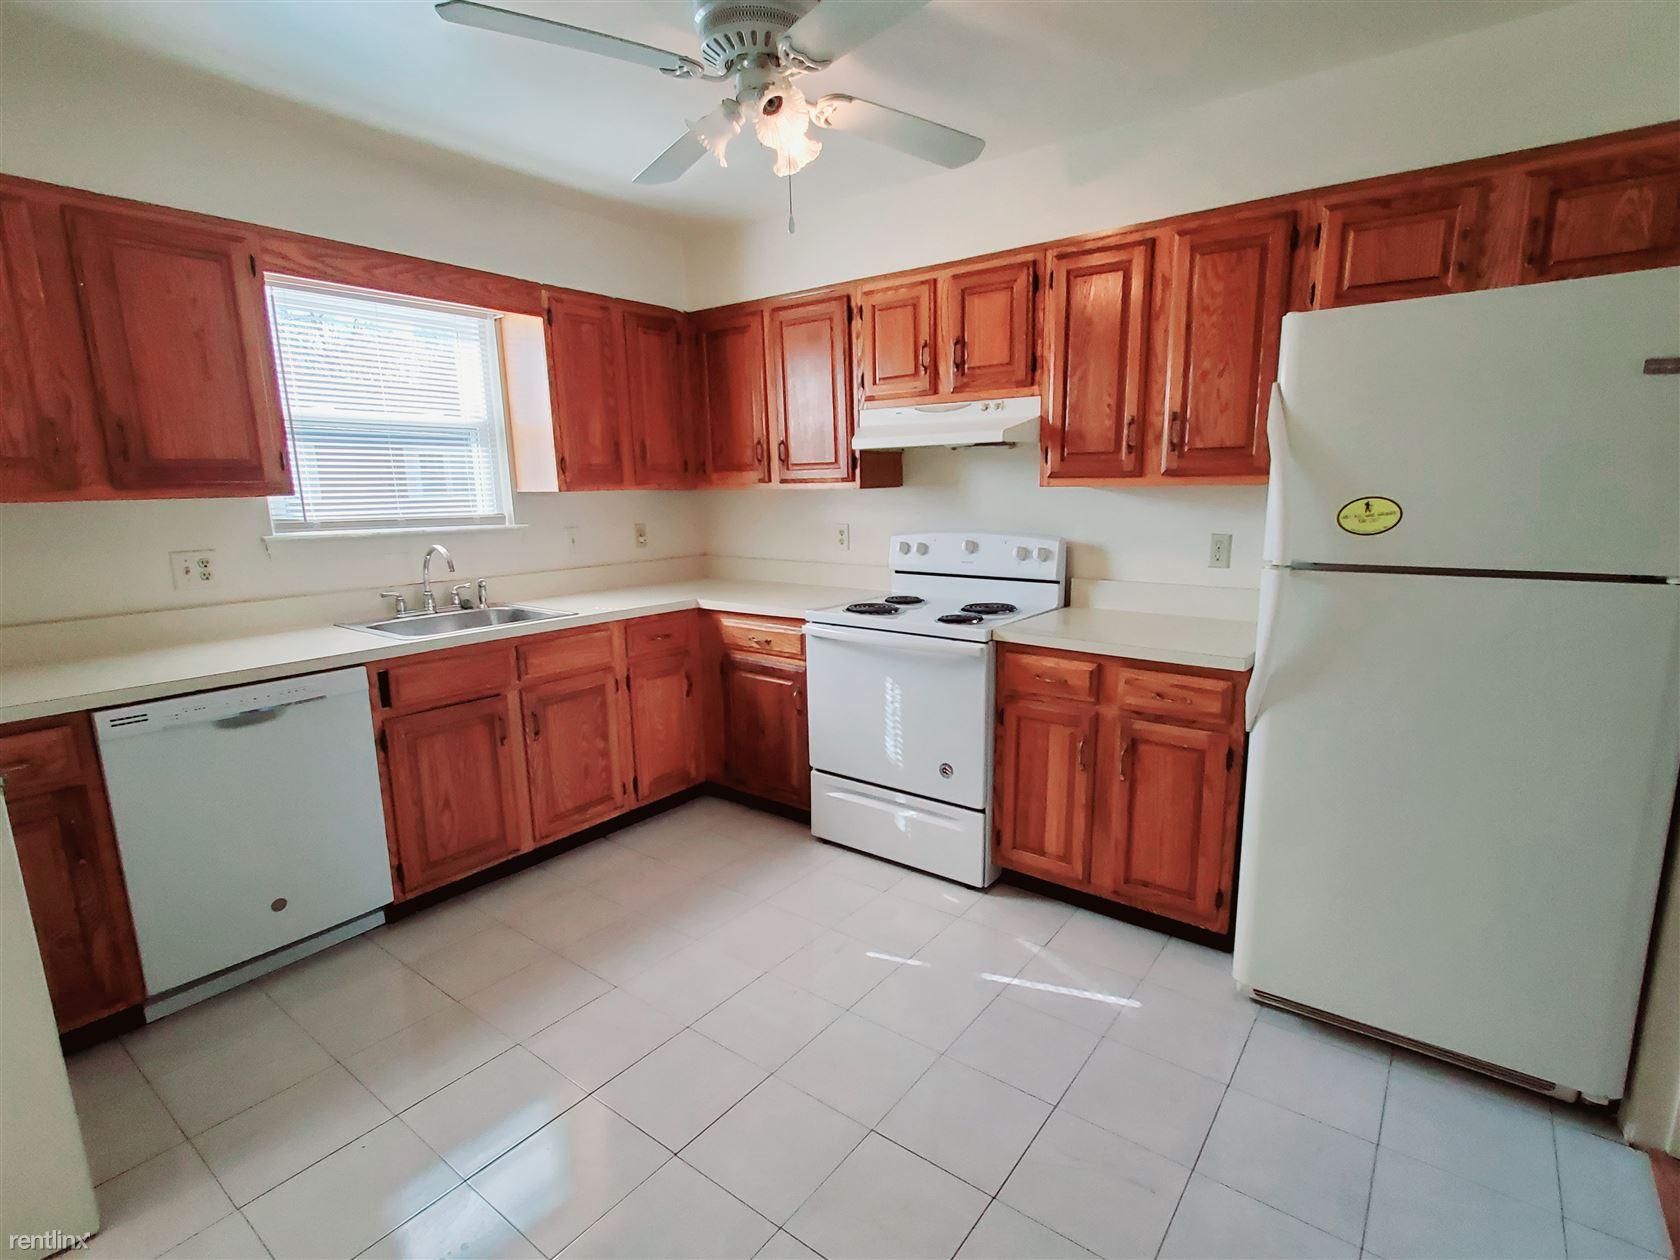 Windsor Rd, Stamford, CT - $2,500